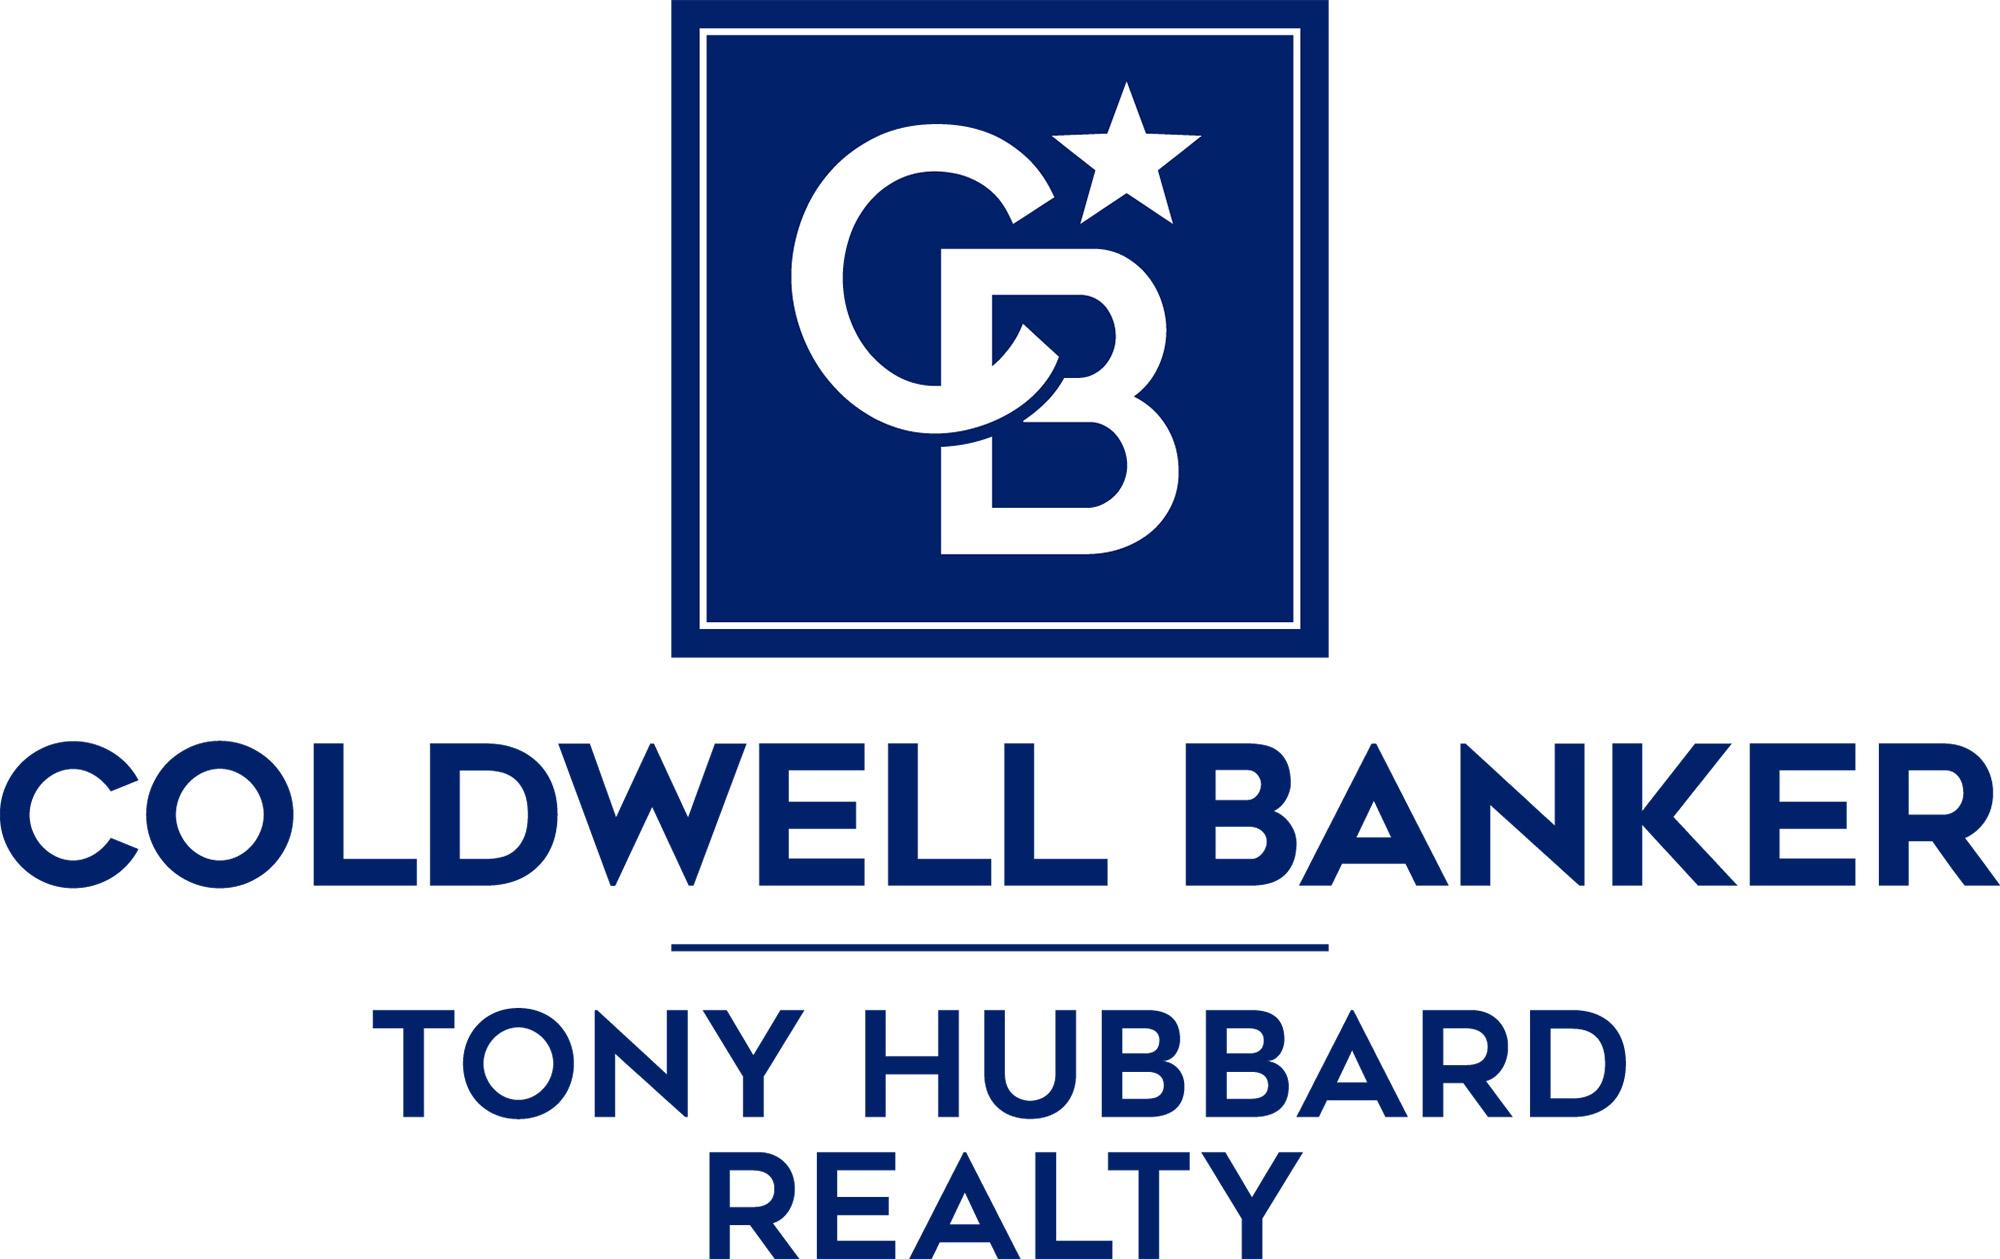 Erica Wood - Coldwell Banker Tony Hubbard Logo